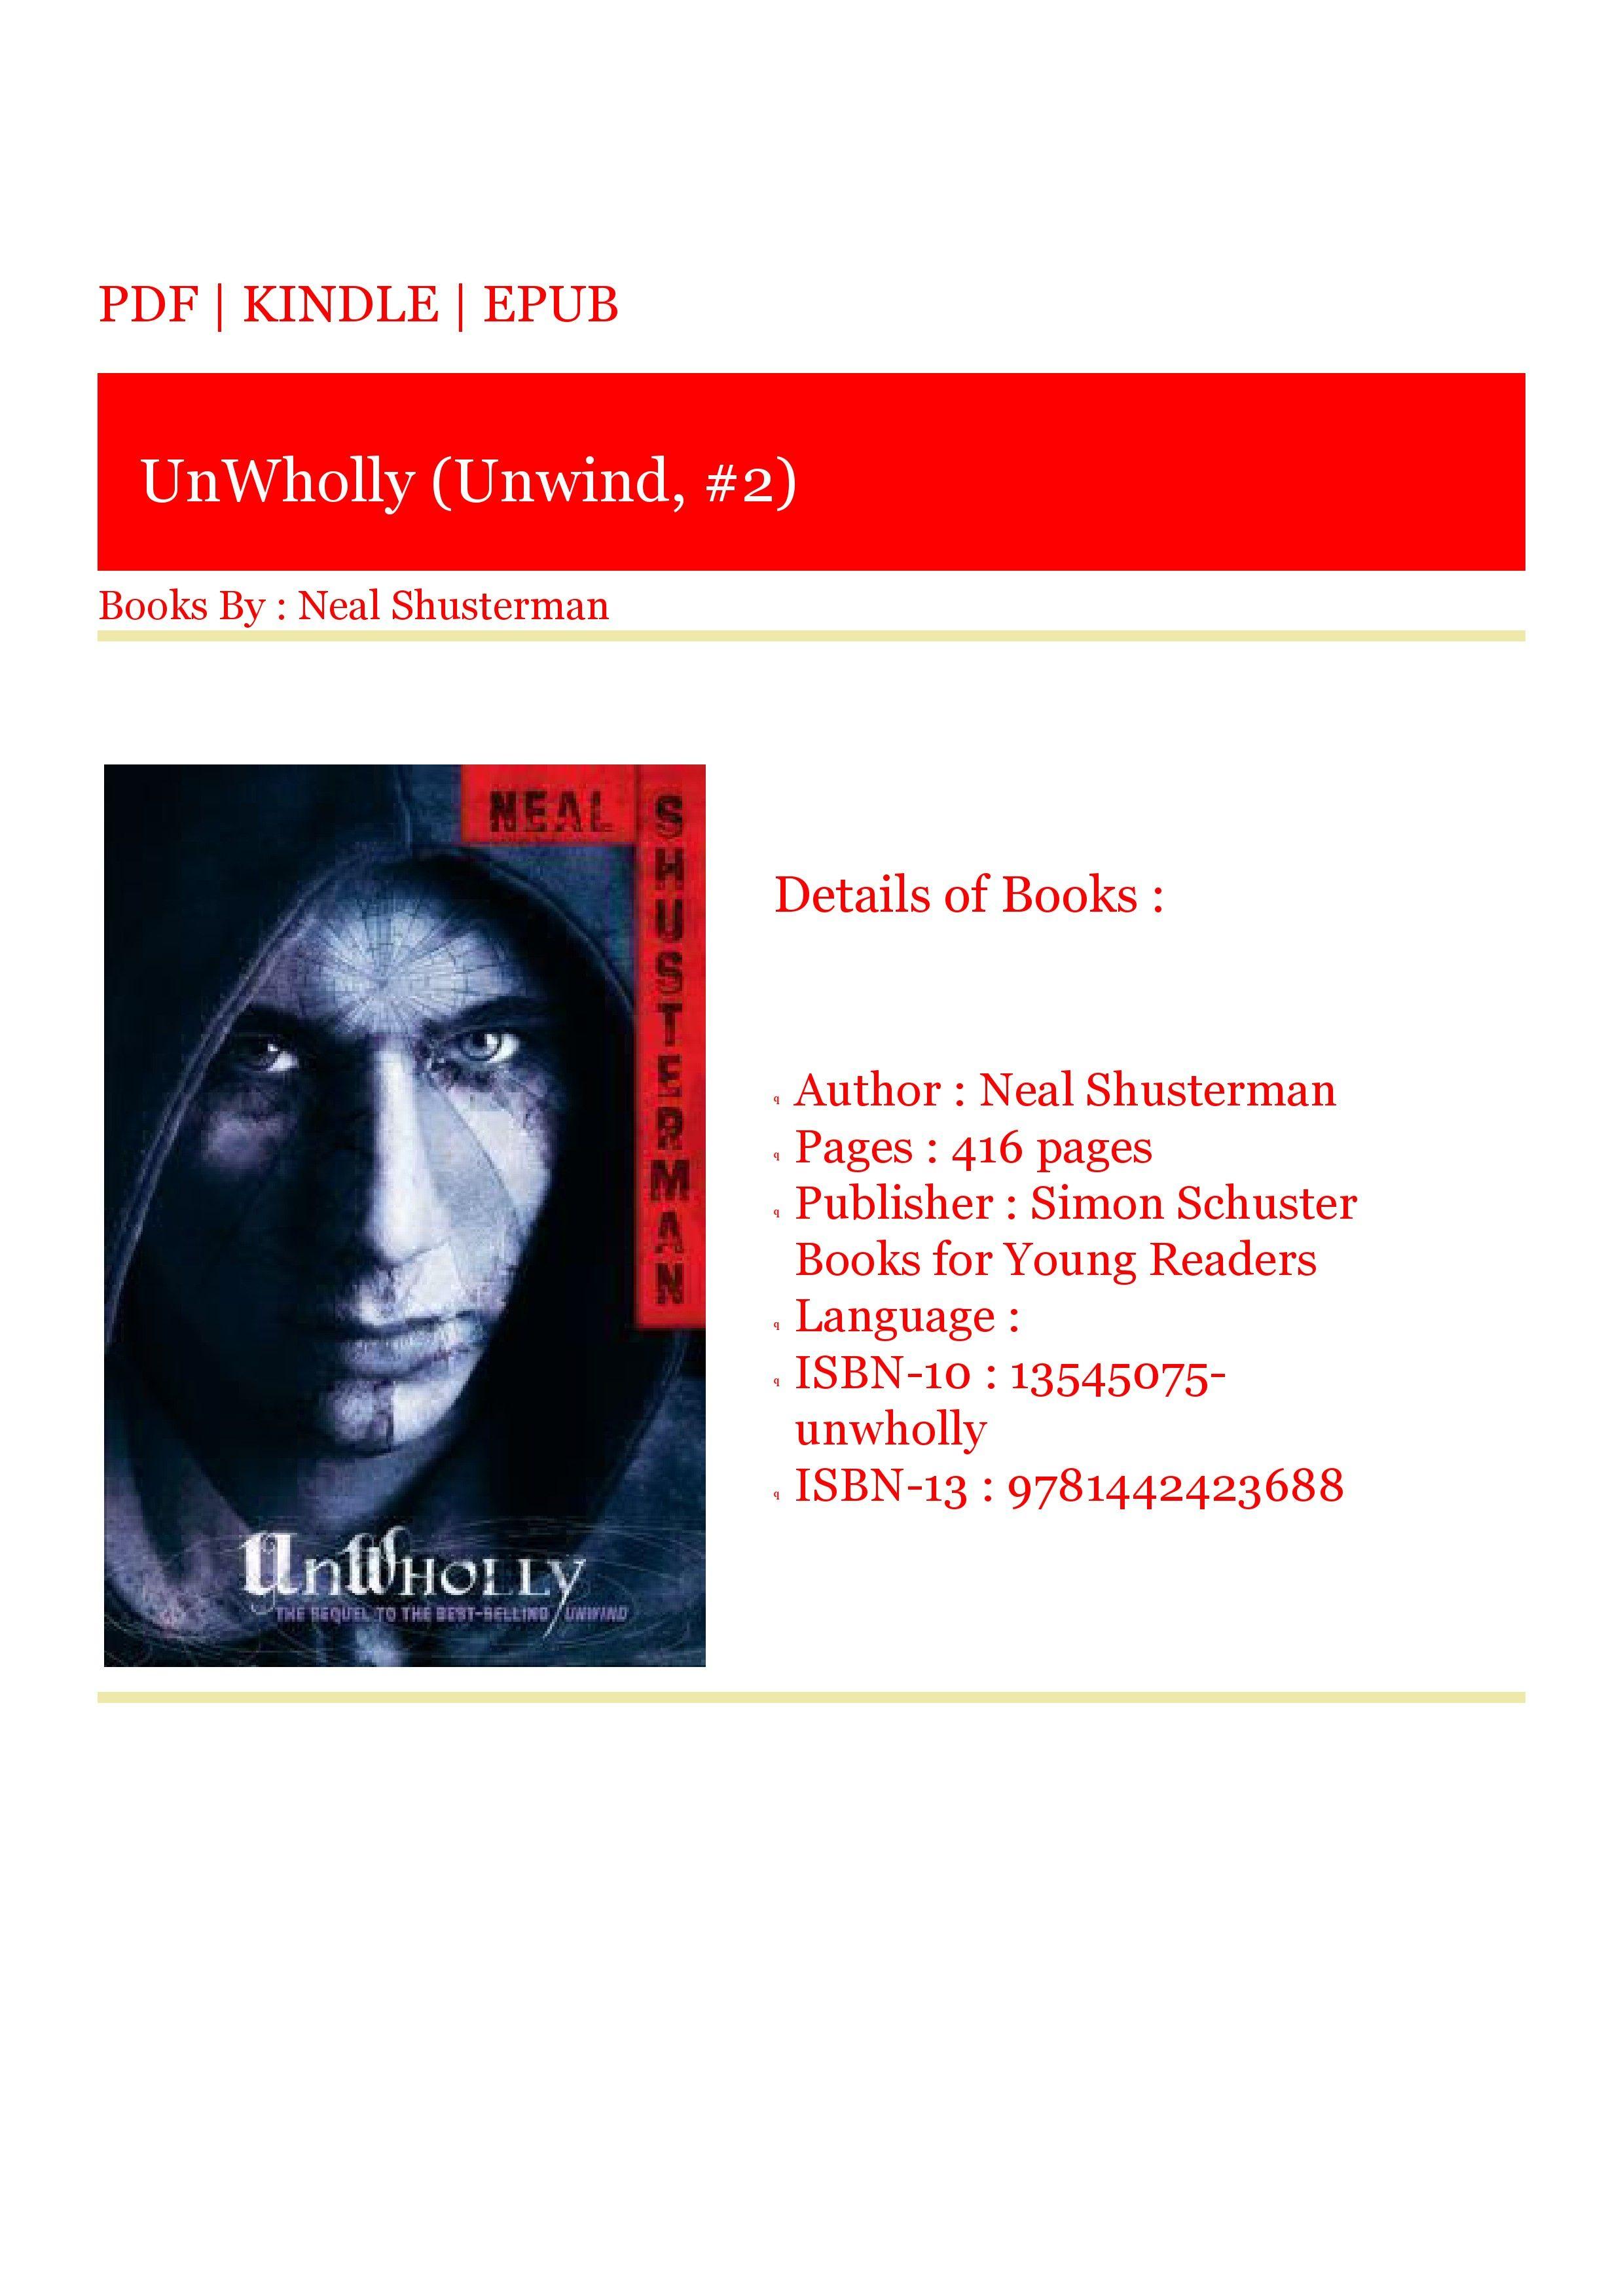 unwind book series movie